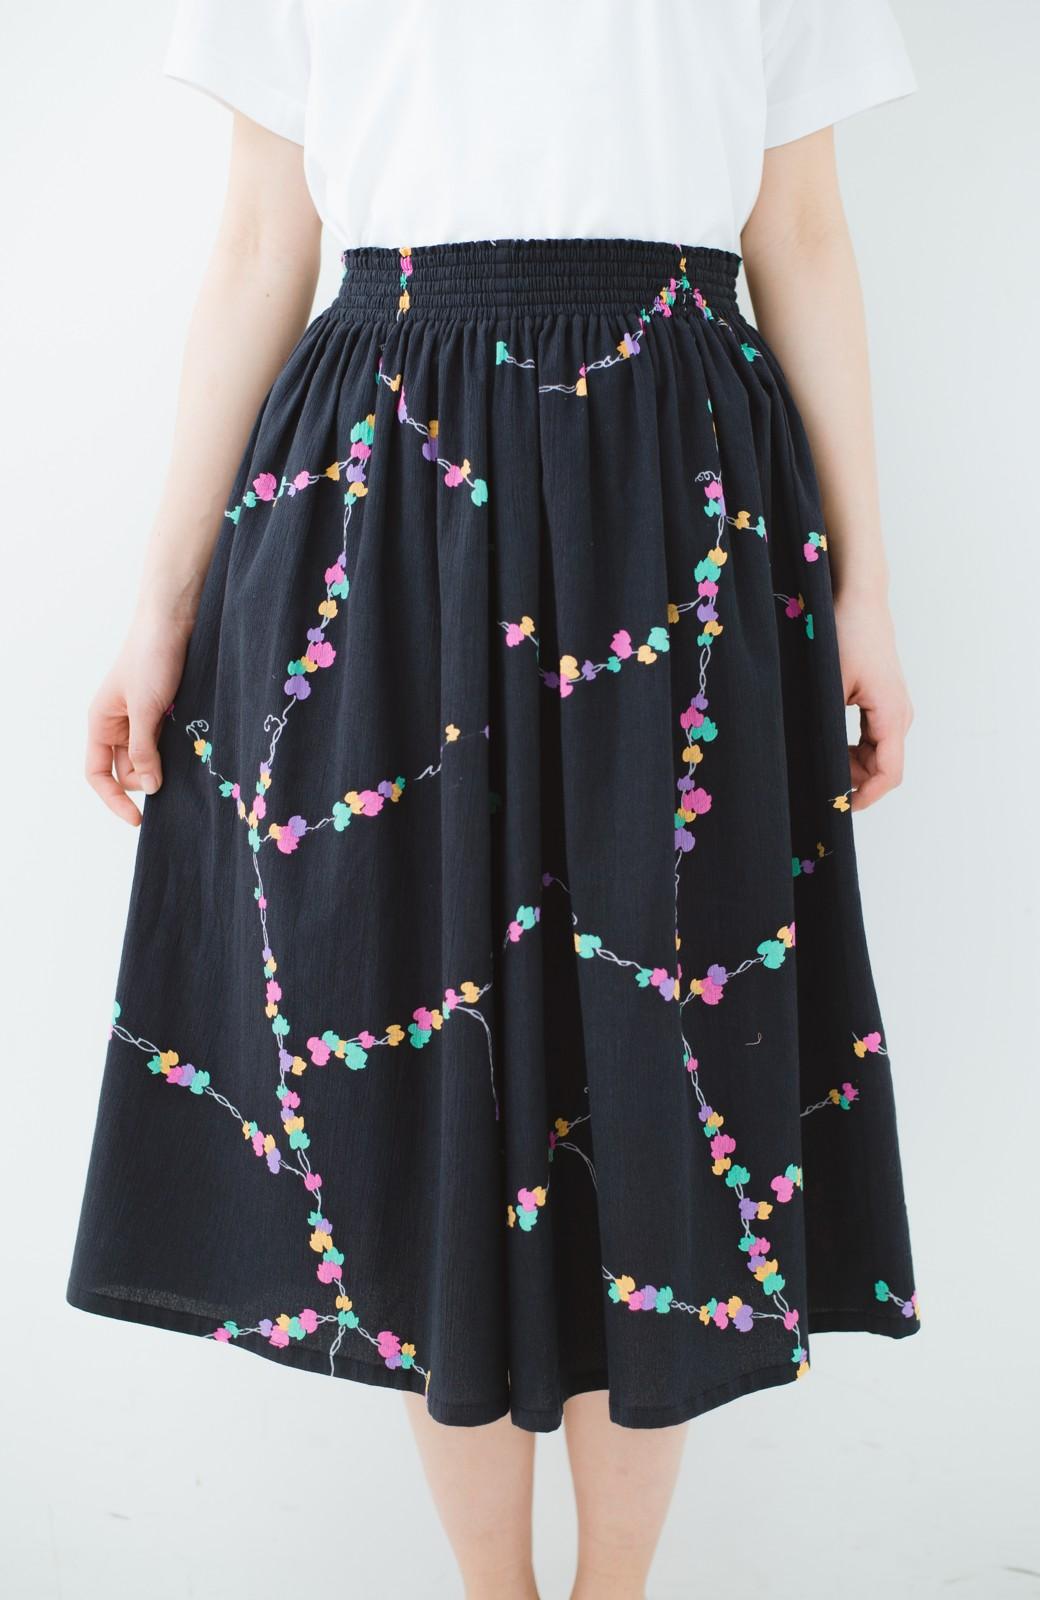 haco! 京都の浴衣屋さんと作った浴衣生地のスカート <ブラック系その他>の商品写真7